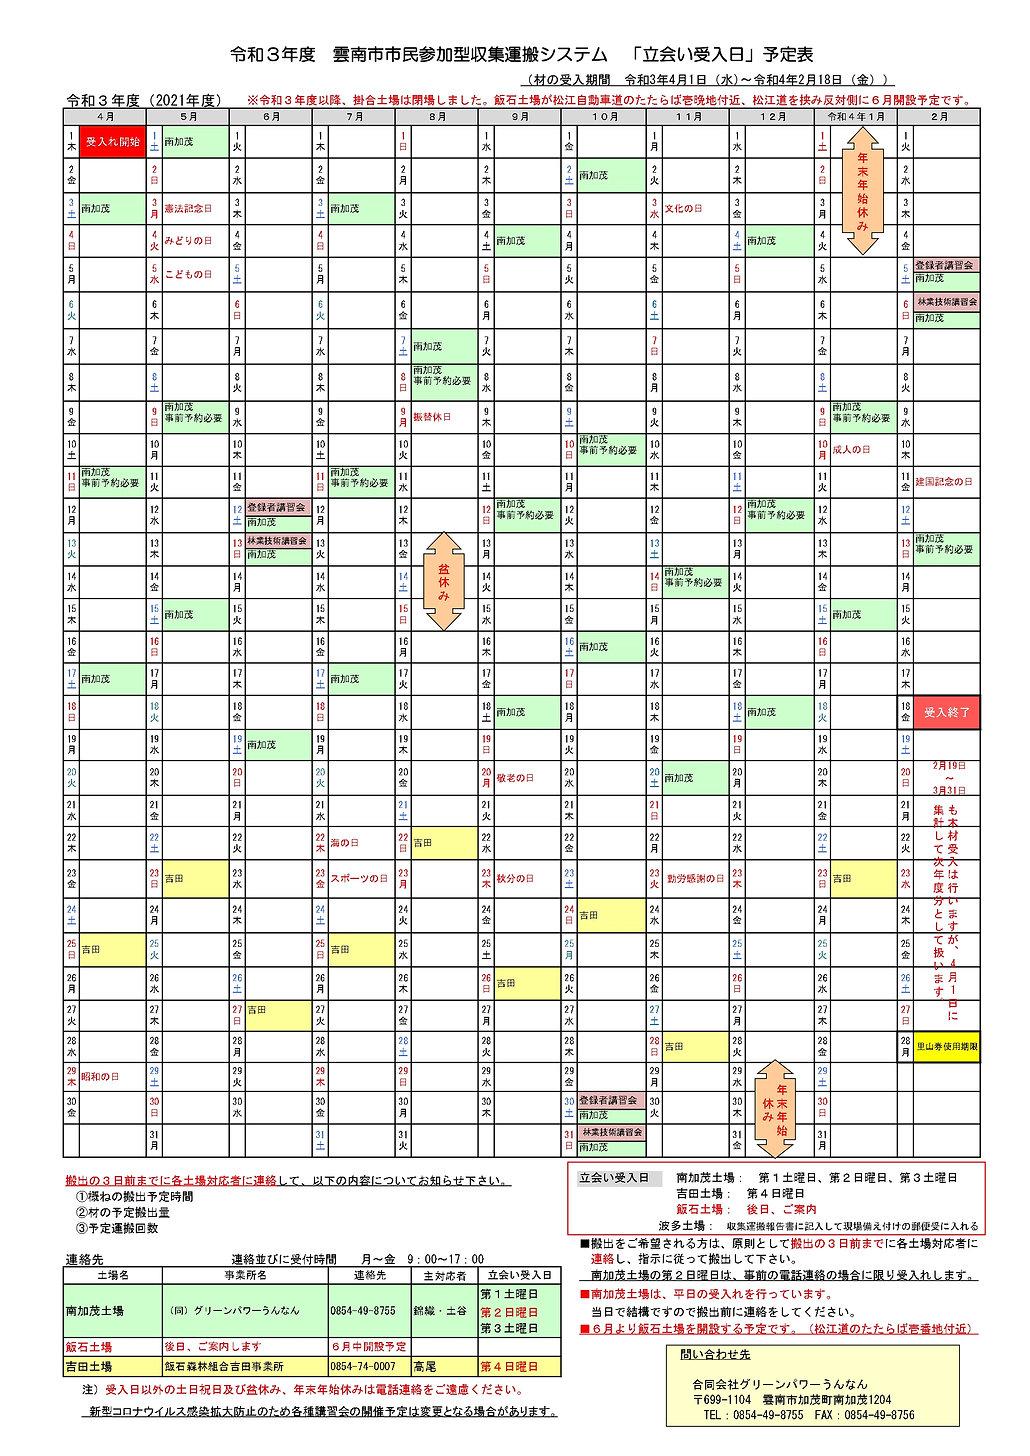 ■令和3年度立会い受入日予定表 20210401_page-0001.jpg